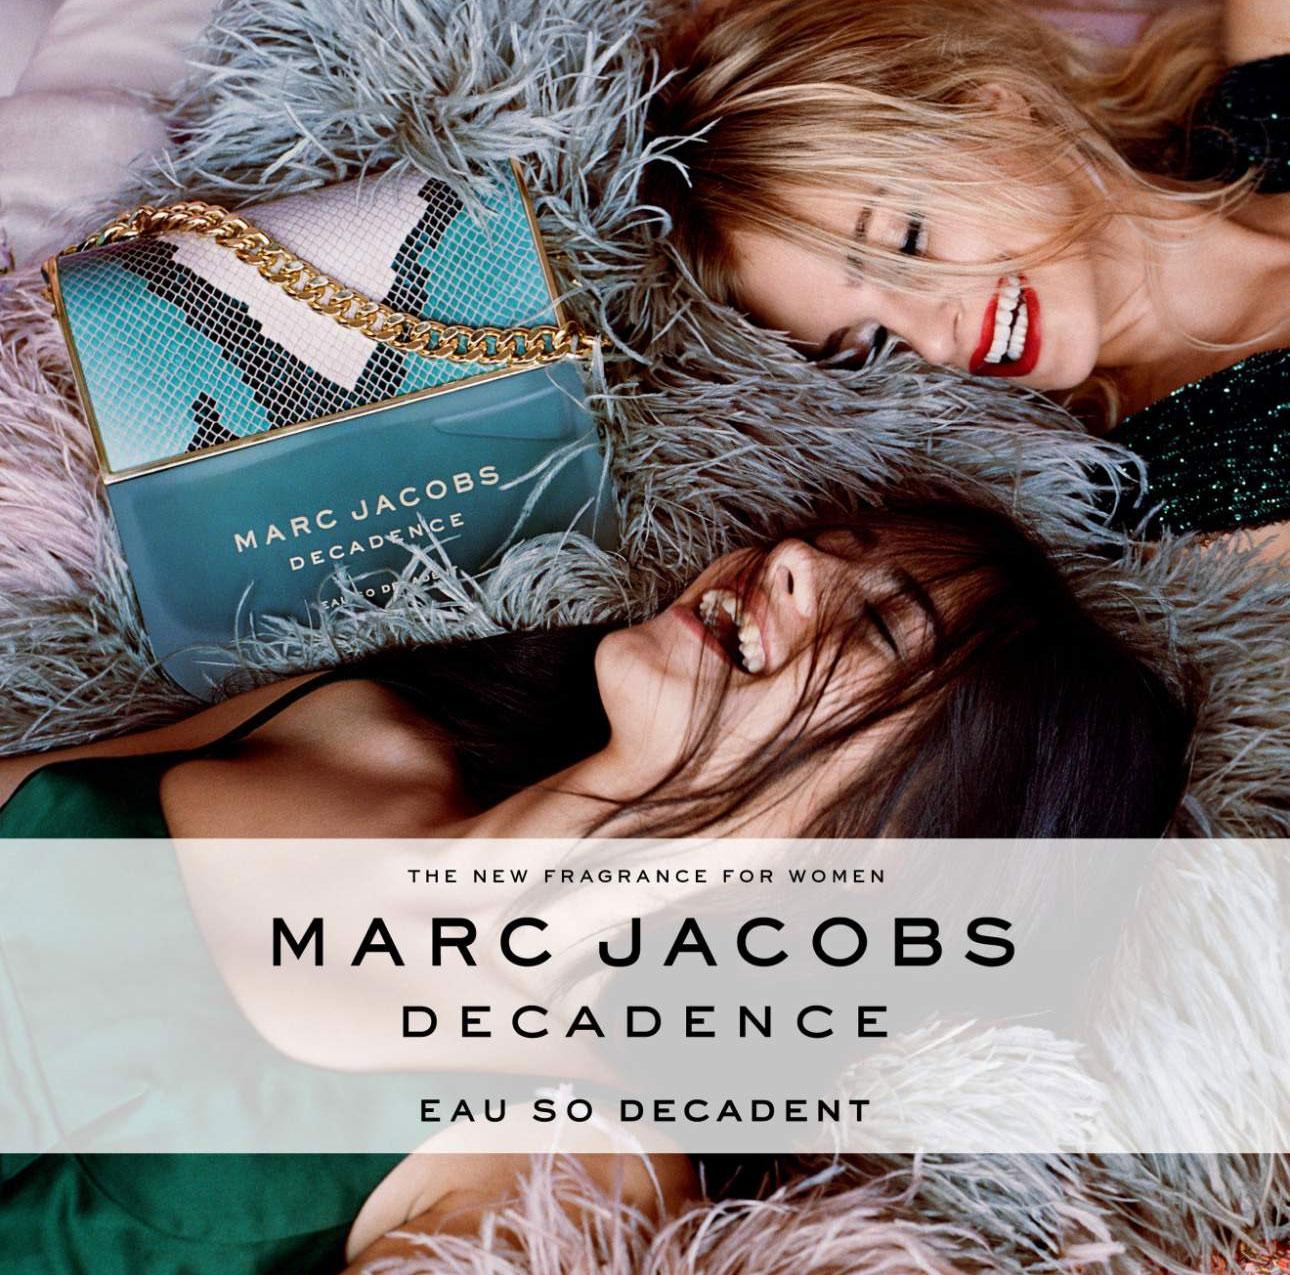 9decbed3f09a Marc Jacobs Decadence Eau So Decadent ~ New Fragrances